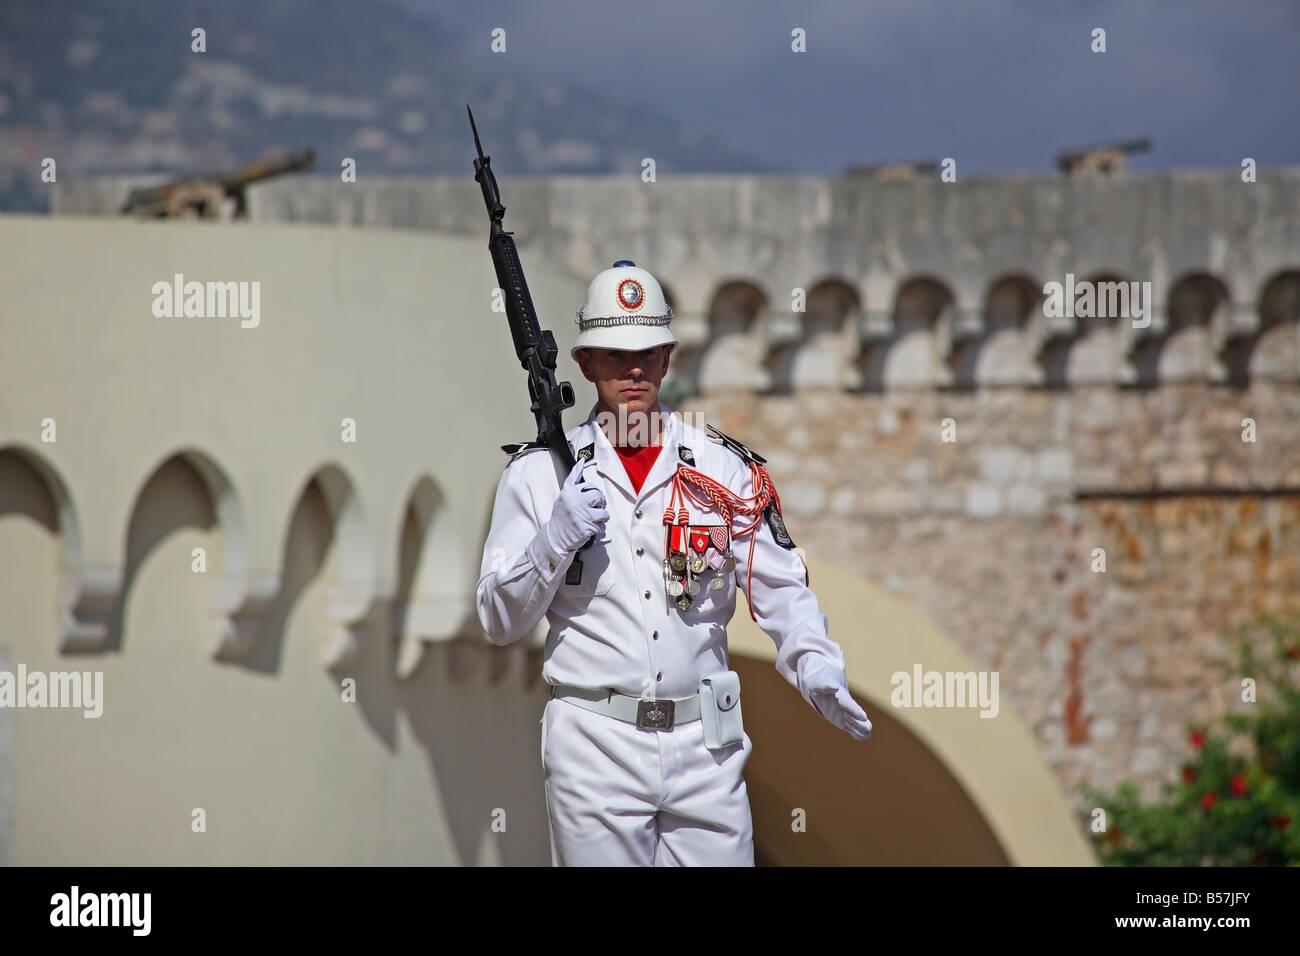 Guard in front of the Royal Palace, Place du Palais, Monaco Ville, Monaco - Stock Image